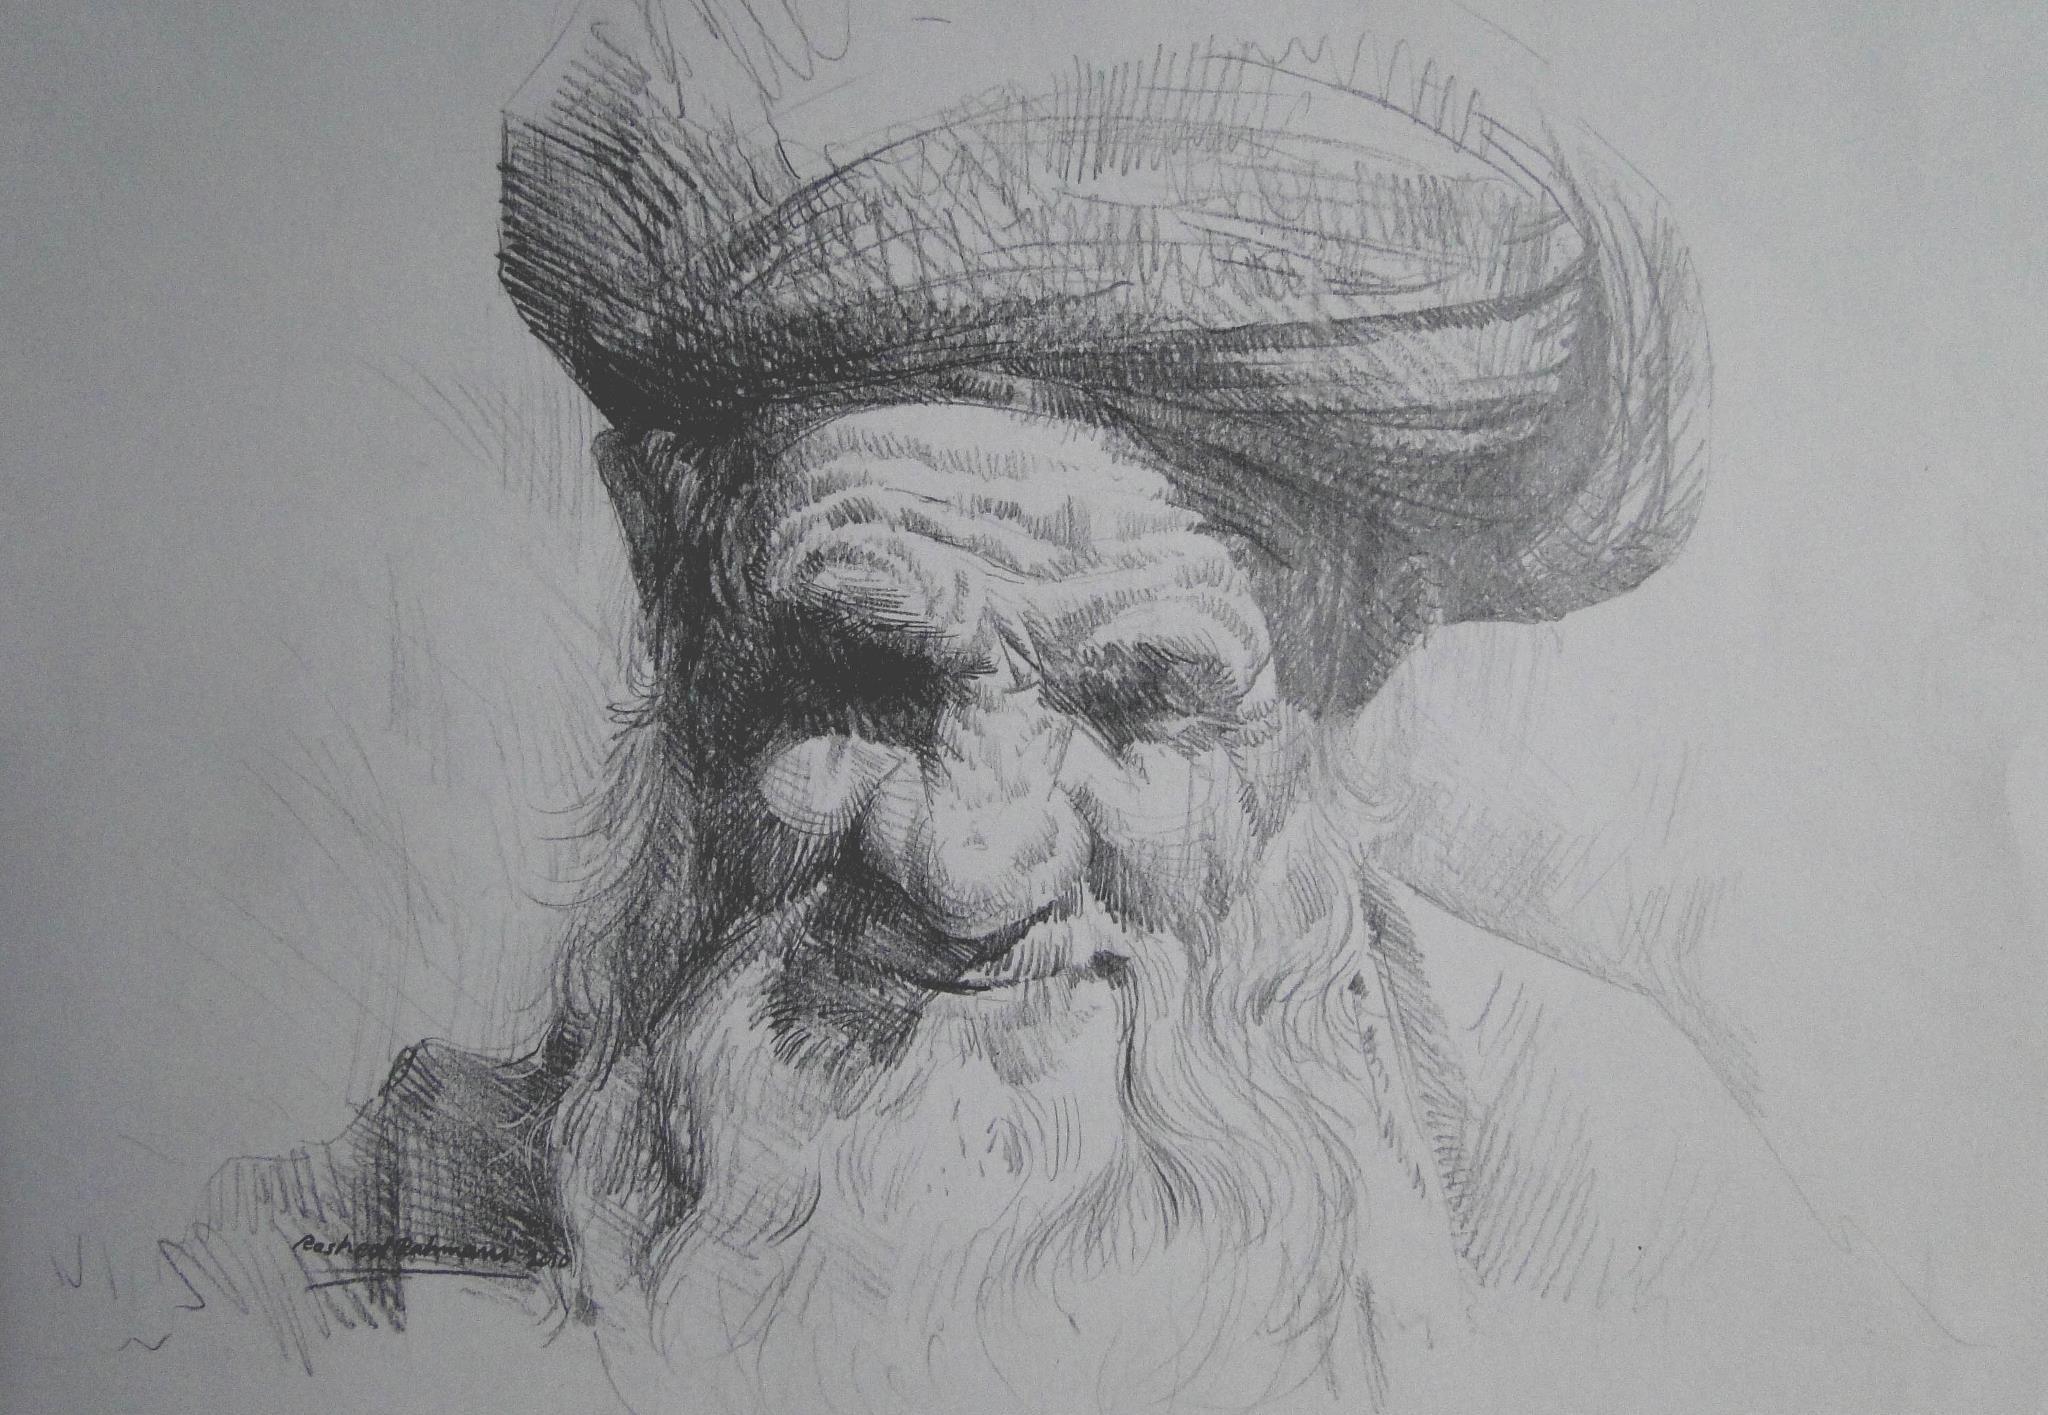 Rashed Rahmani